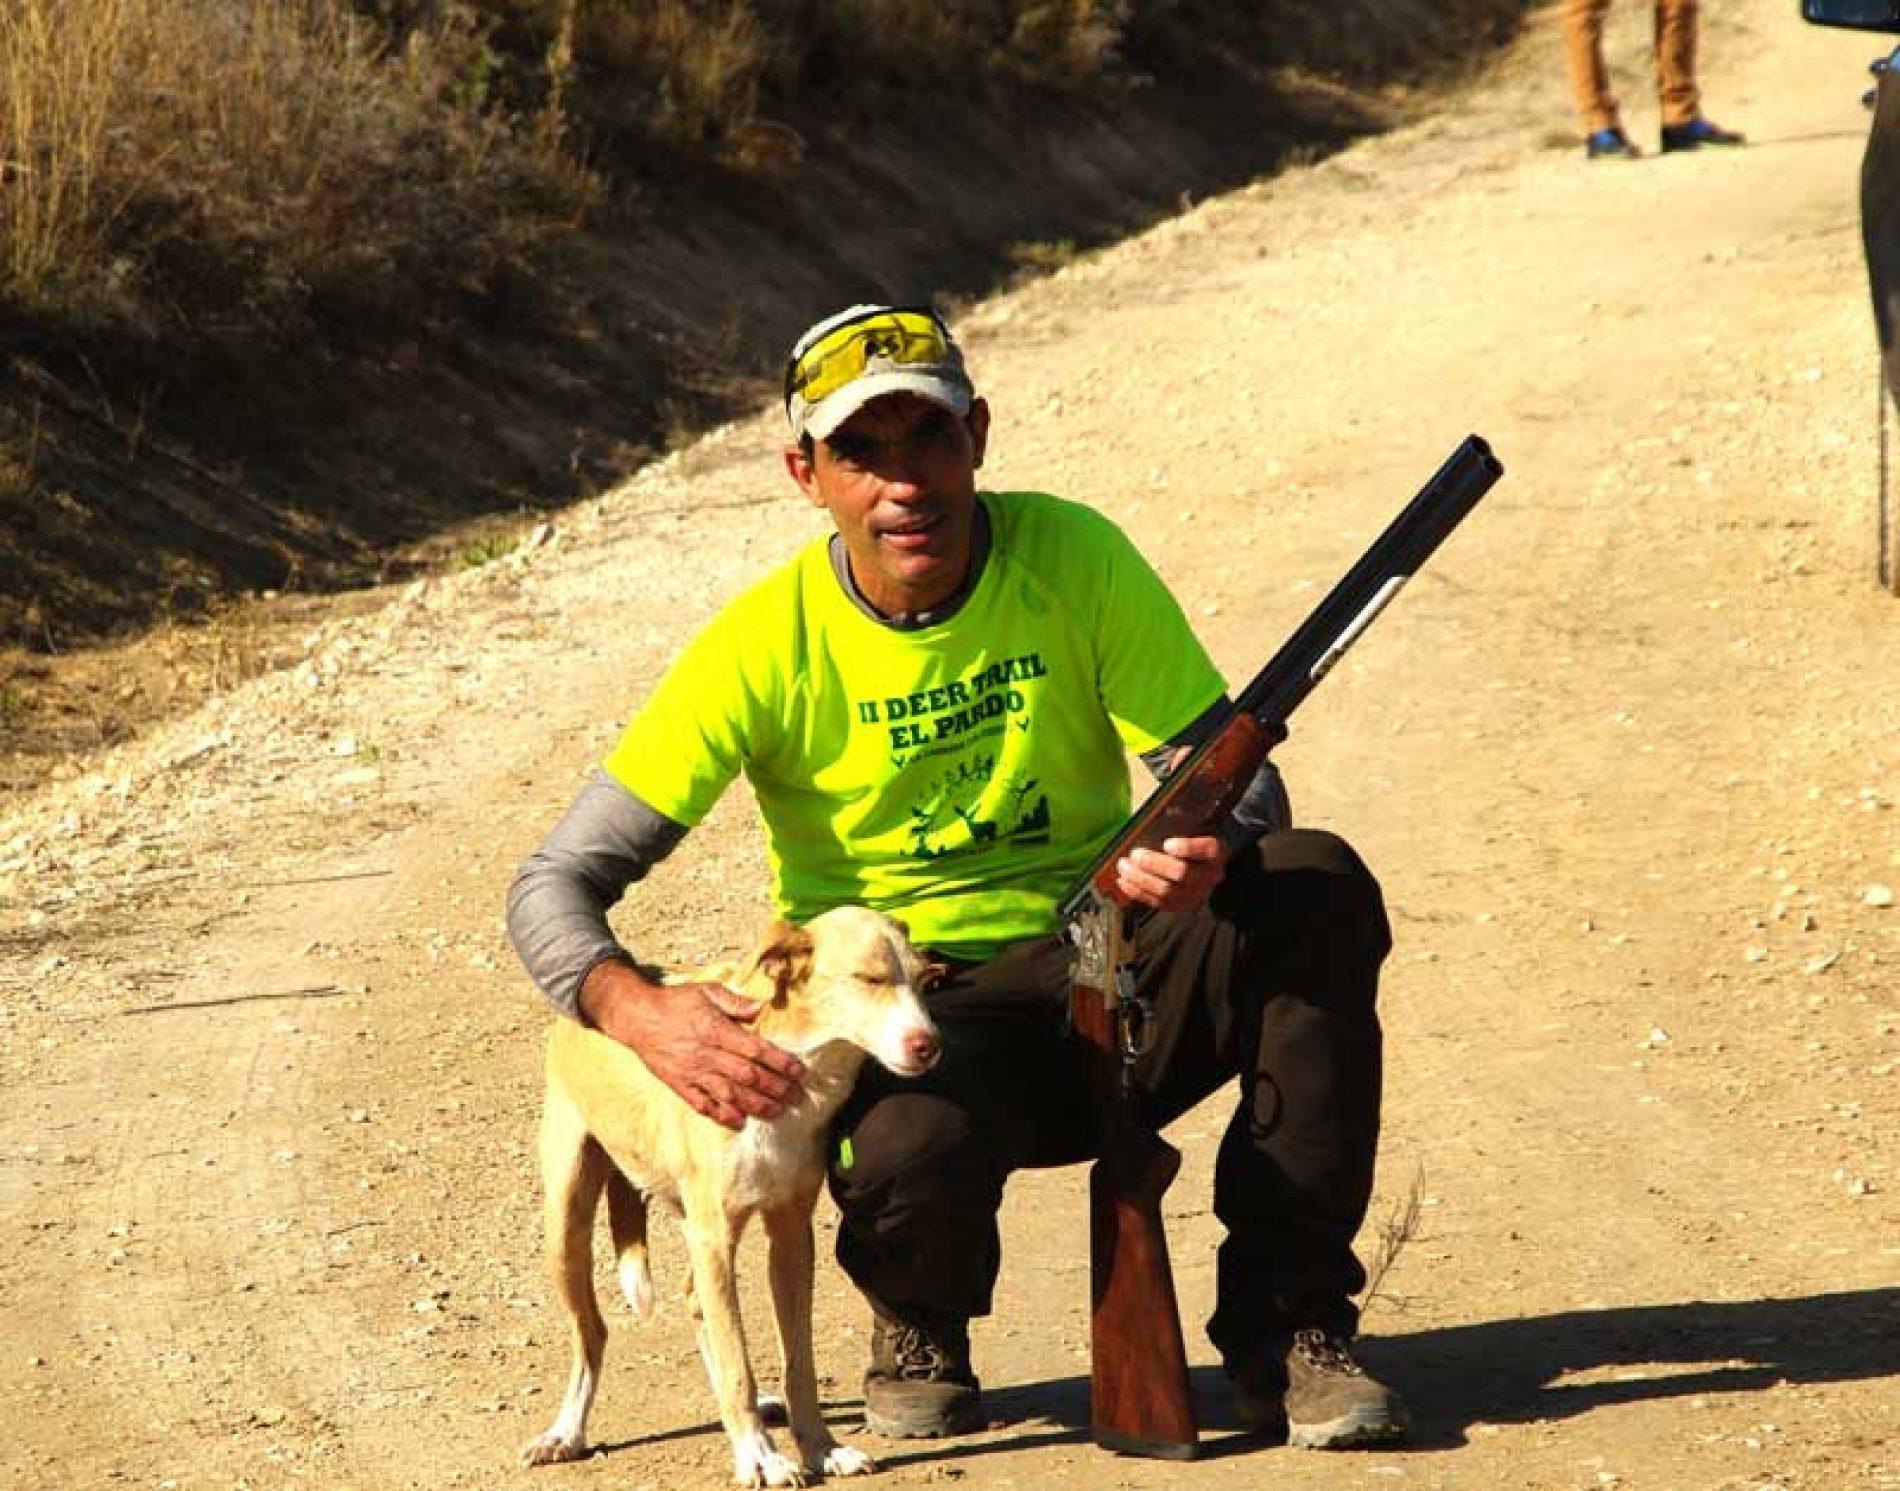 Campeonato madrileño de caza menor con perro 2018